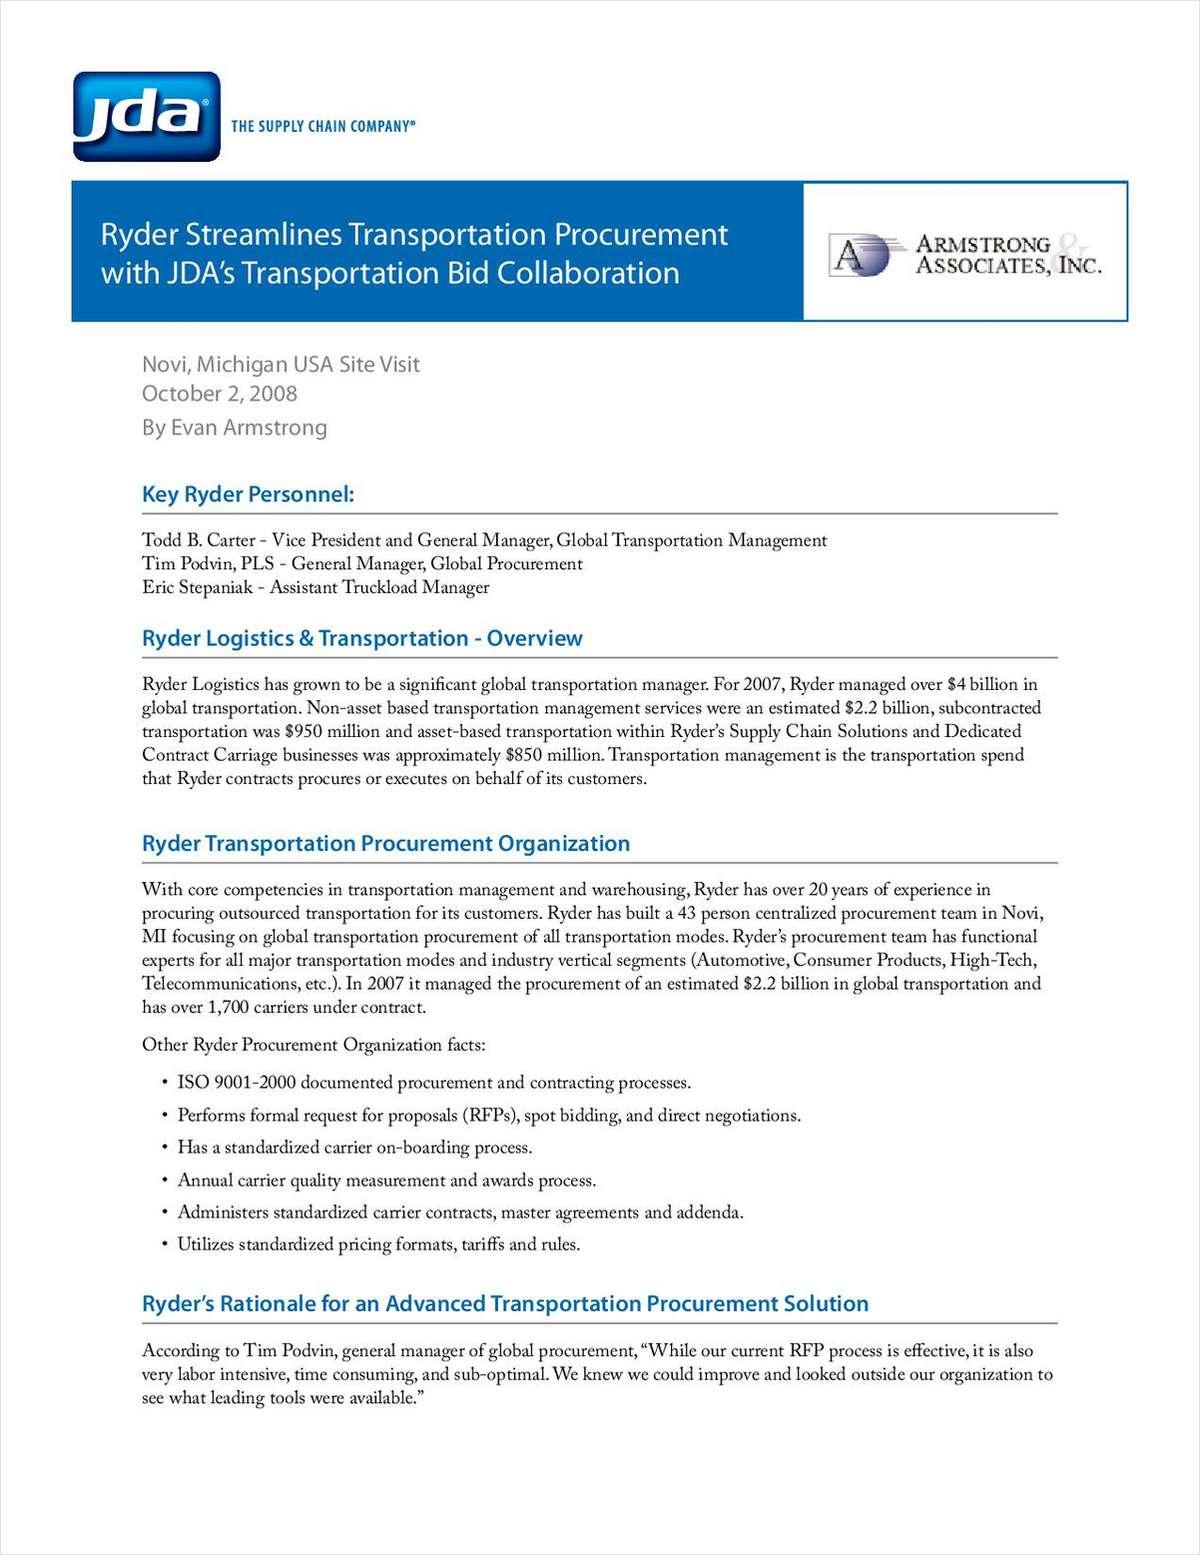 Lower Transportation Costs Through Bid Collaboration